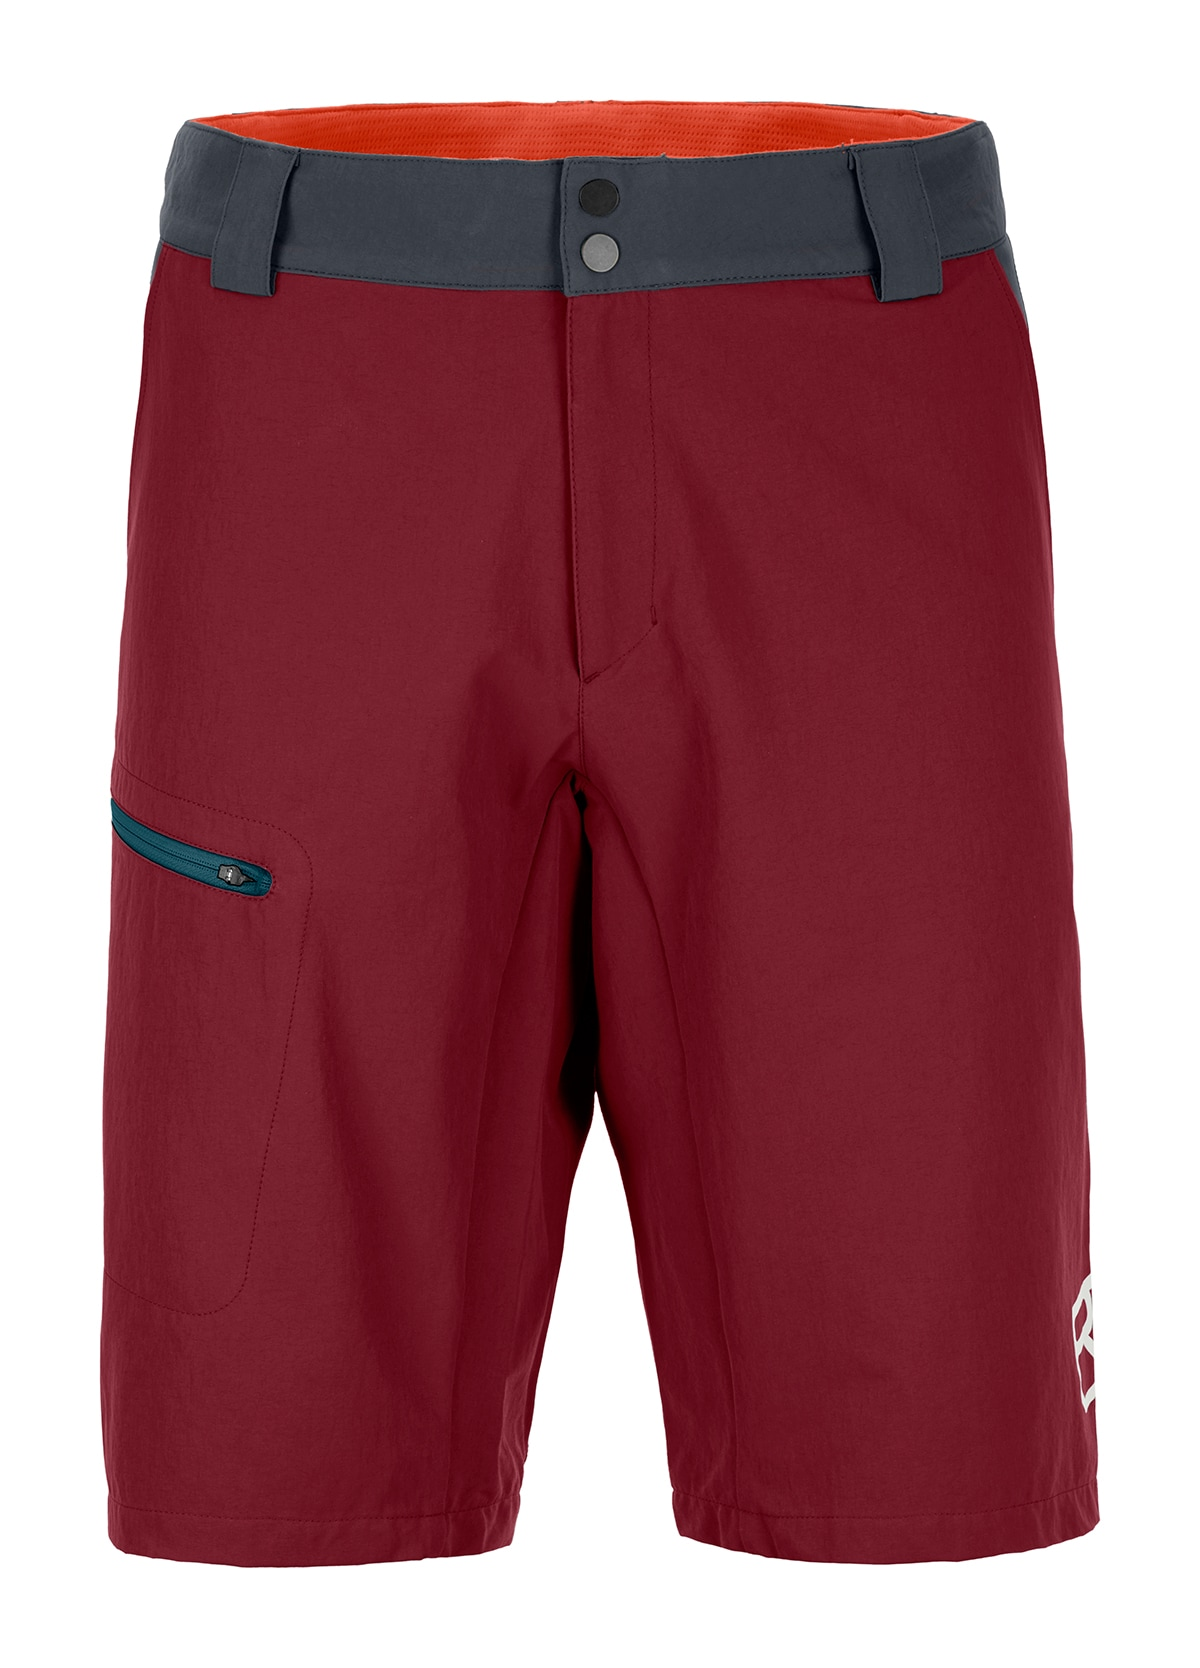 Ortovox Pelmo Shorts M's, Dark Blood